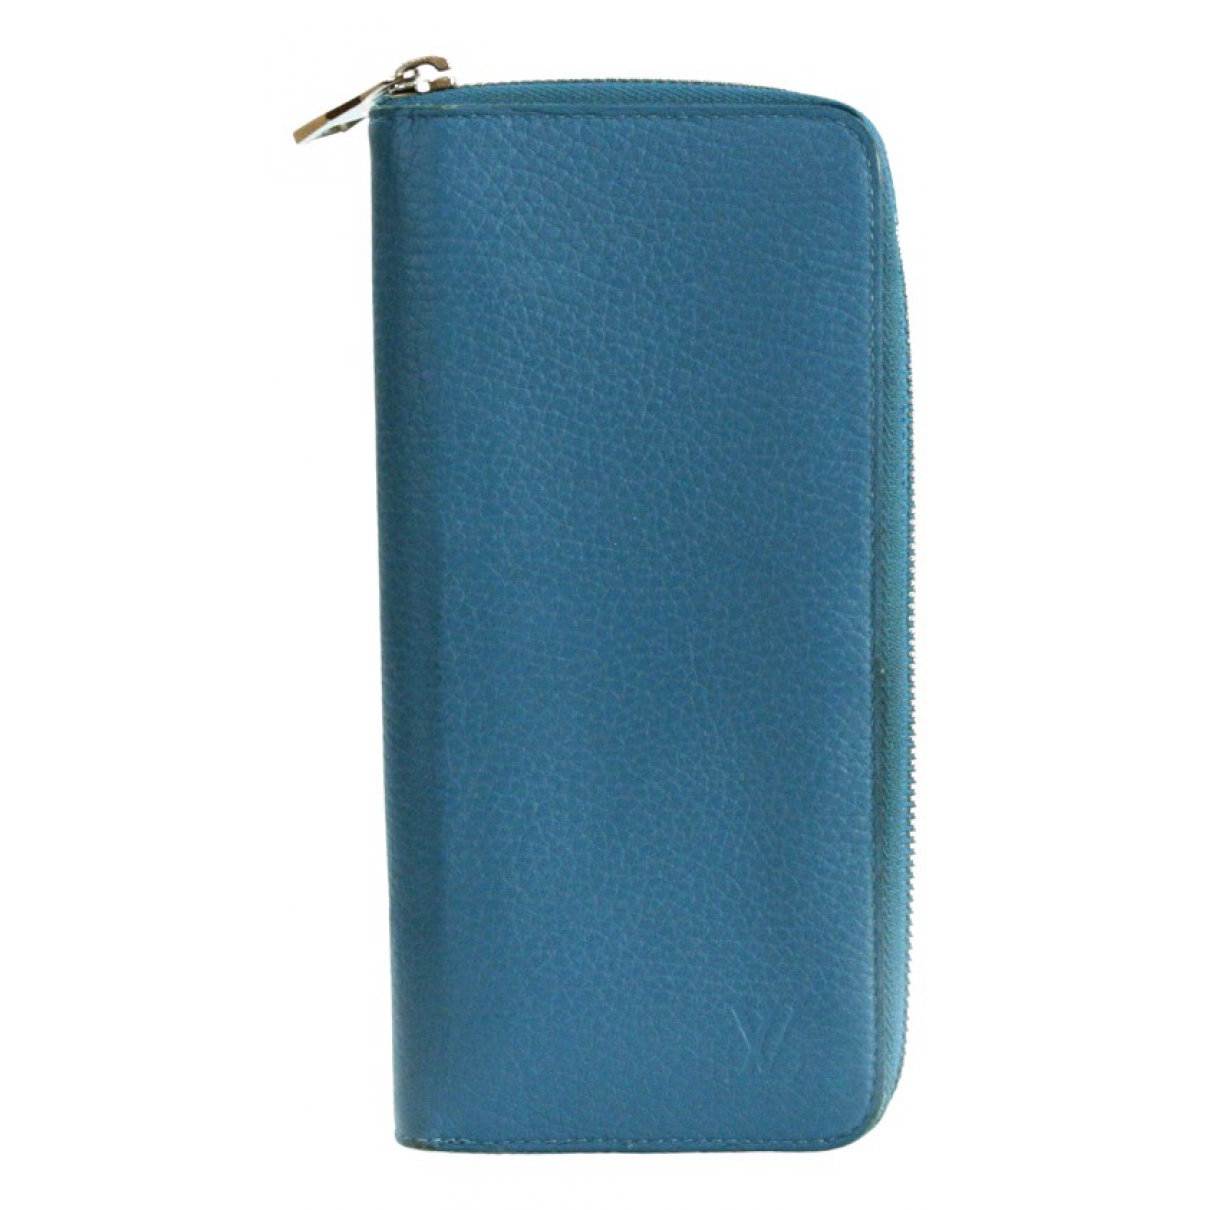 Louis Vuitton \N Kleinlederwaren in  Blau Leder